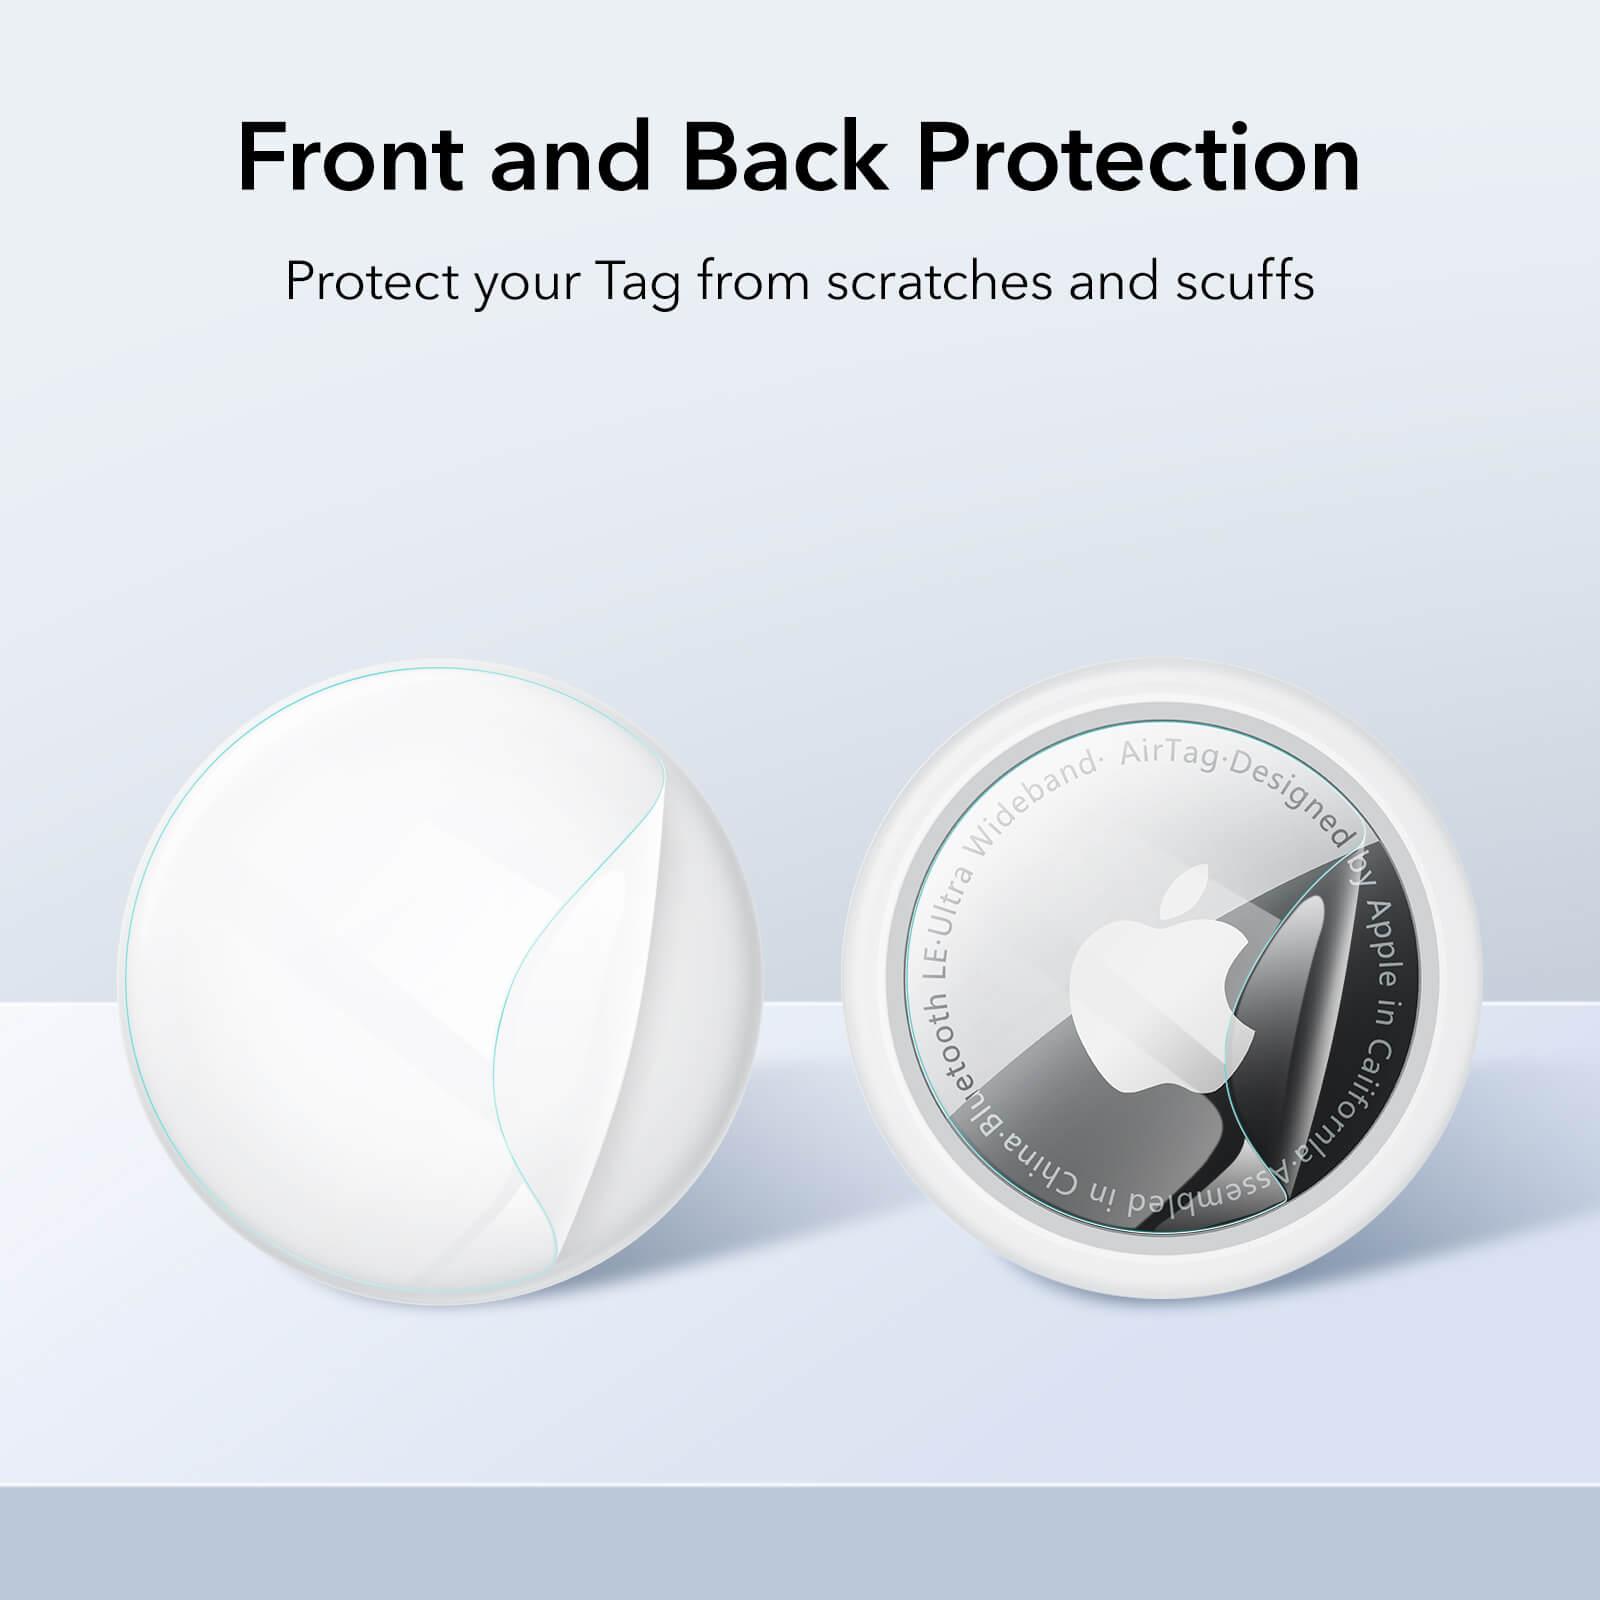 AirTag 2027 Soft Liquid Skin Tag Protector kf